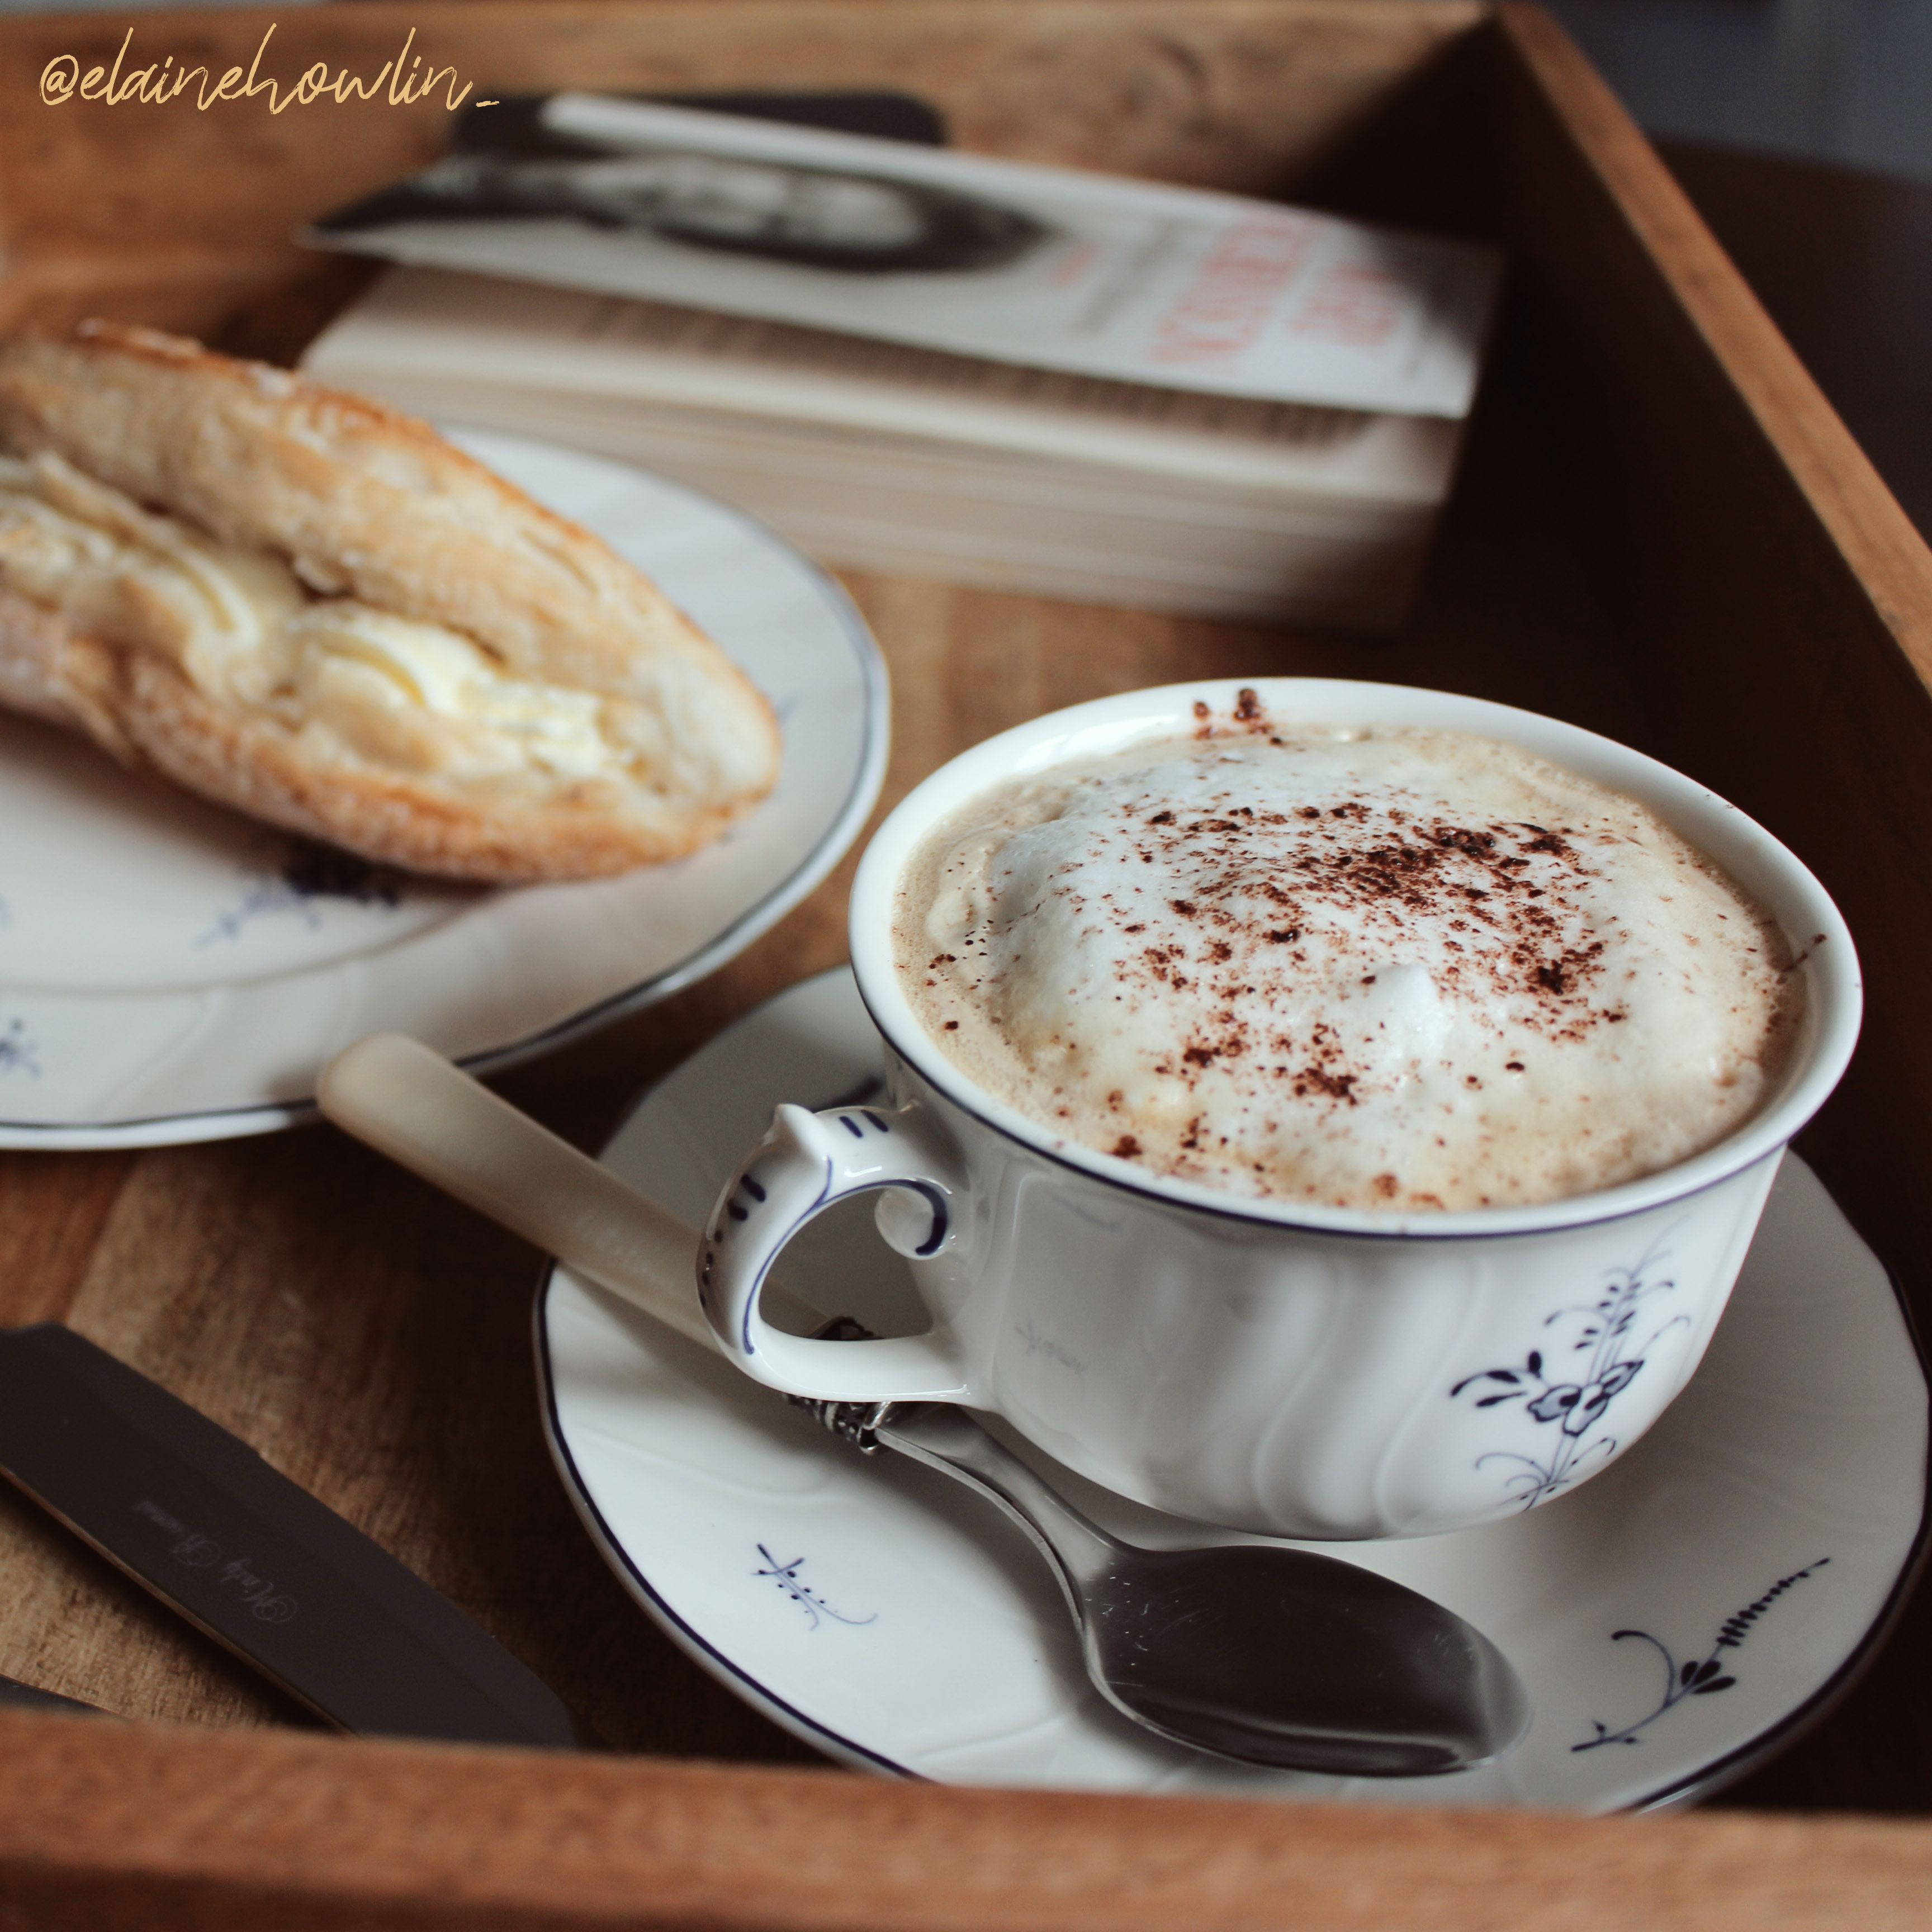 The Irish Readathon Week One Reading Vlog Coffee and Cake Tray Elaine Howlin